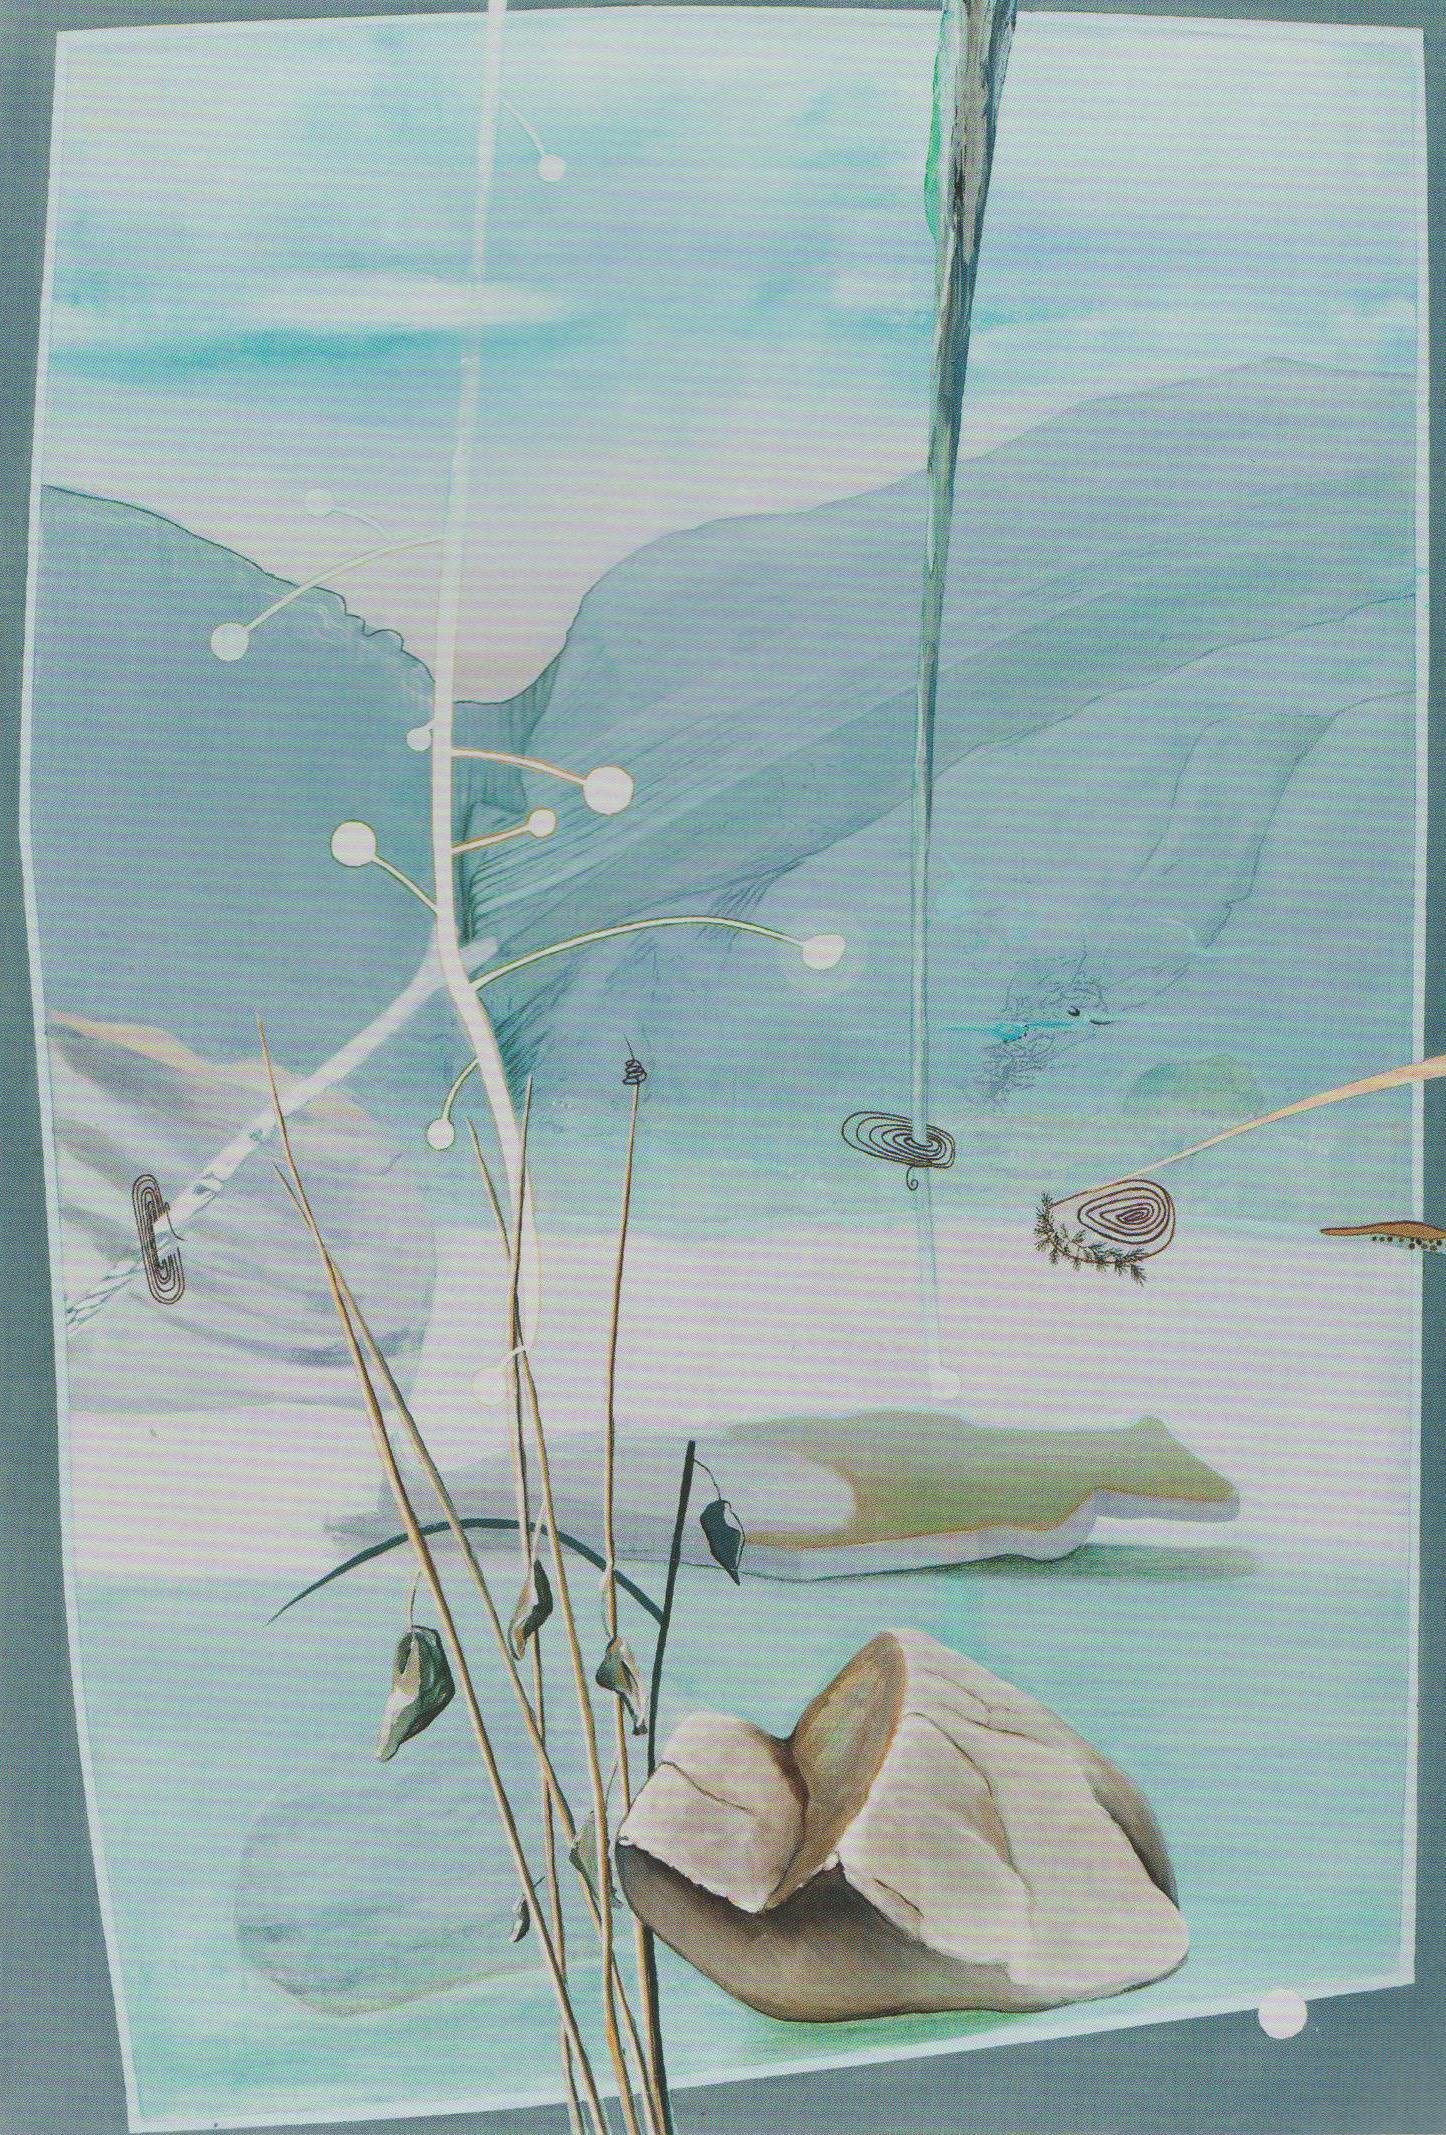 Taurus-Gebirge V, 2009 oil on canvas 220x150cm